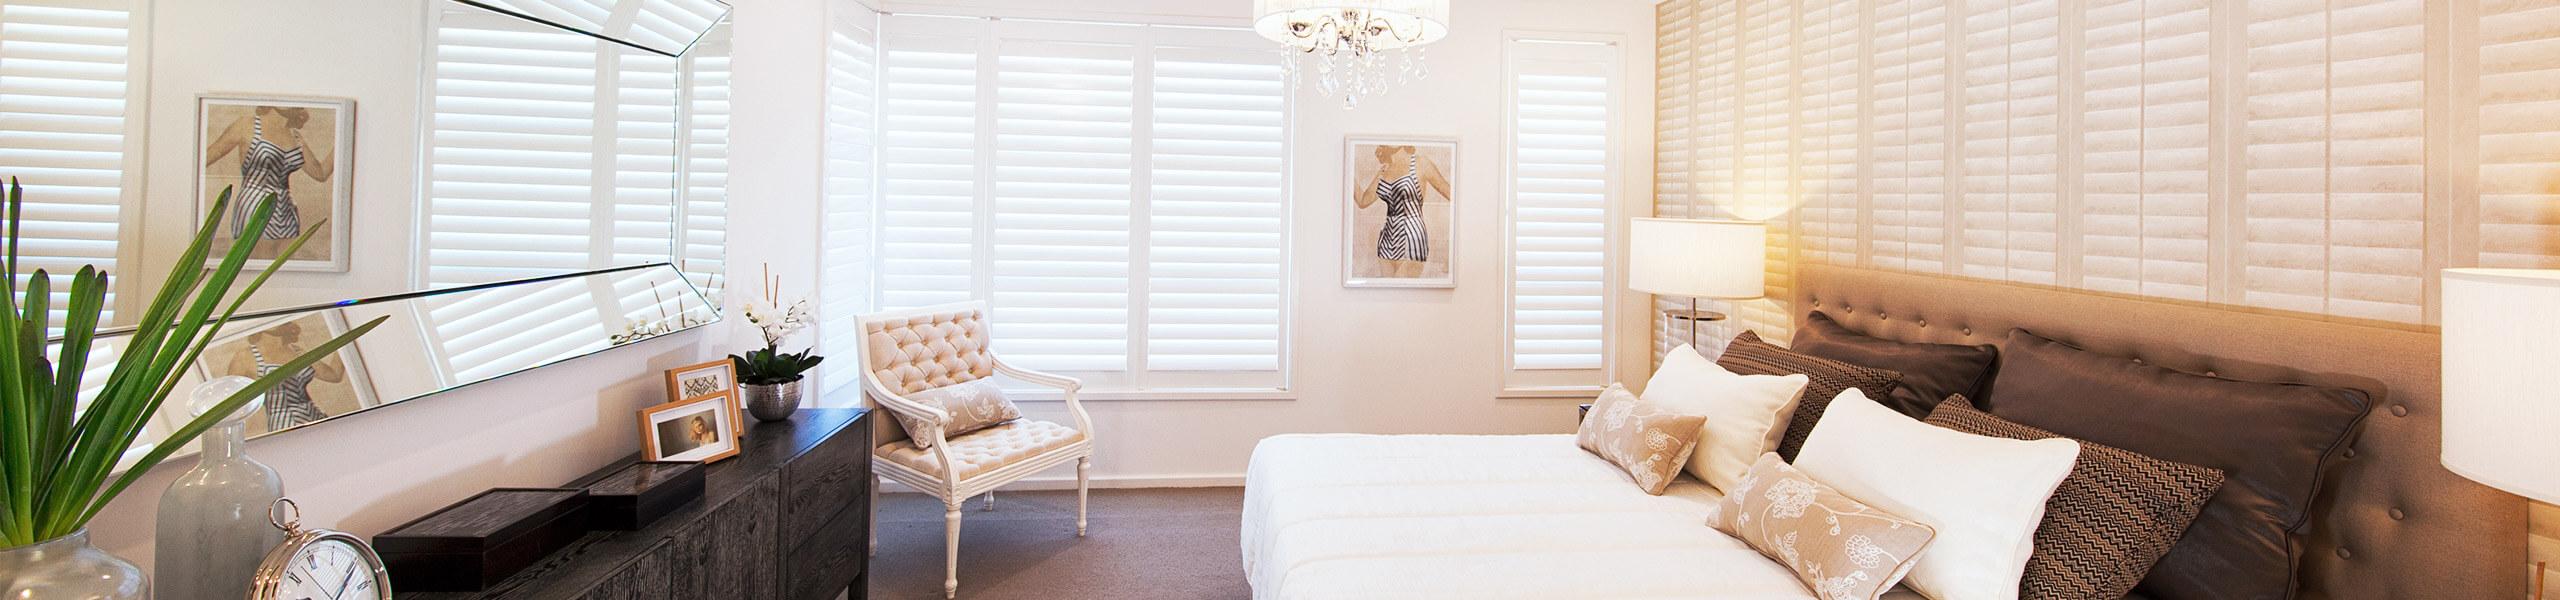 interior designers insideoutside-design bedroom